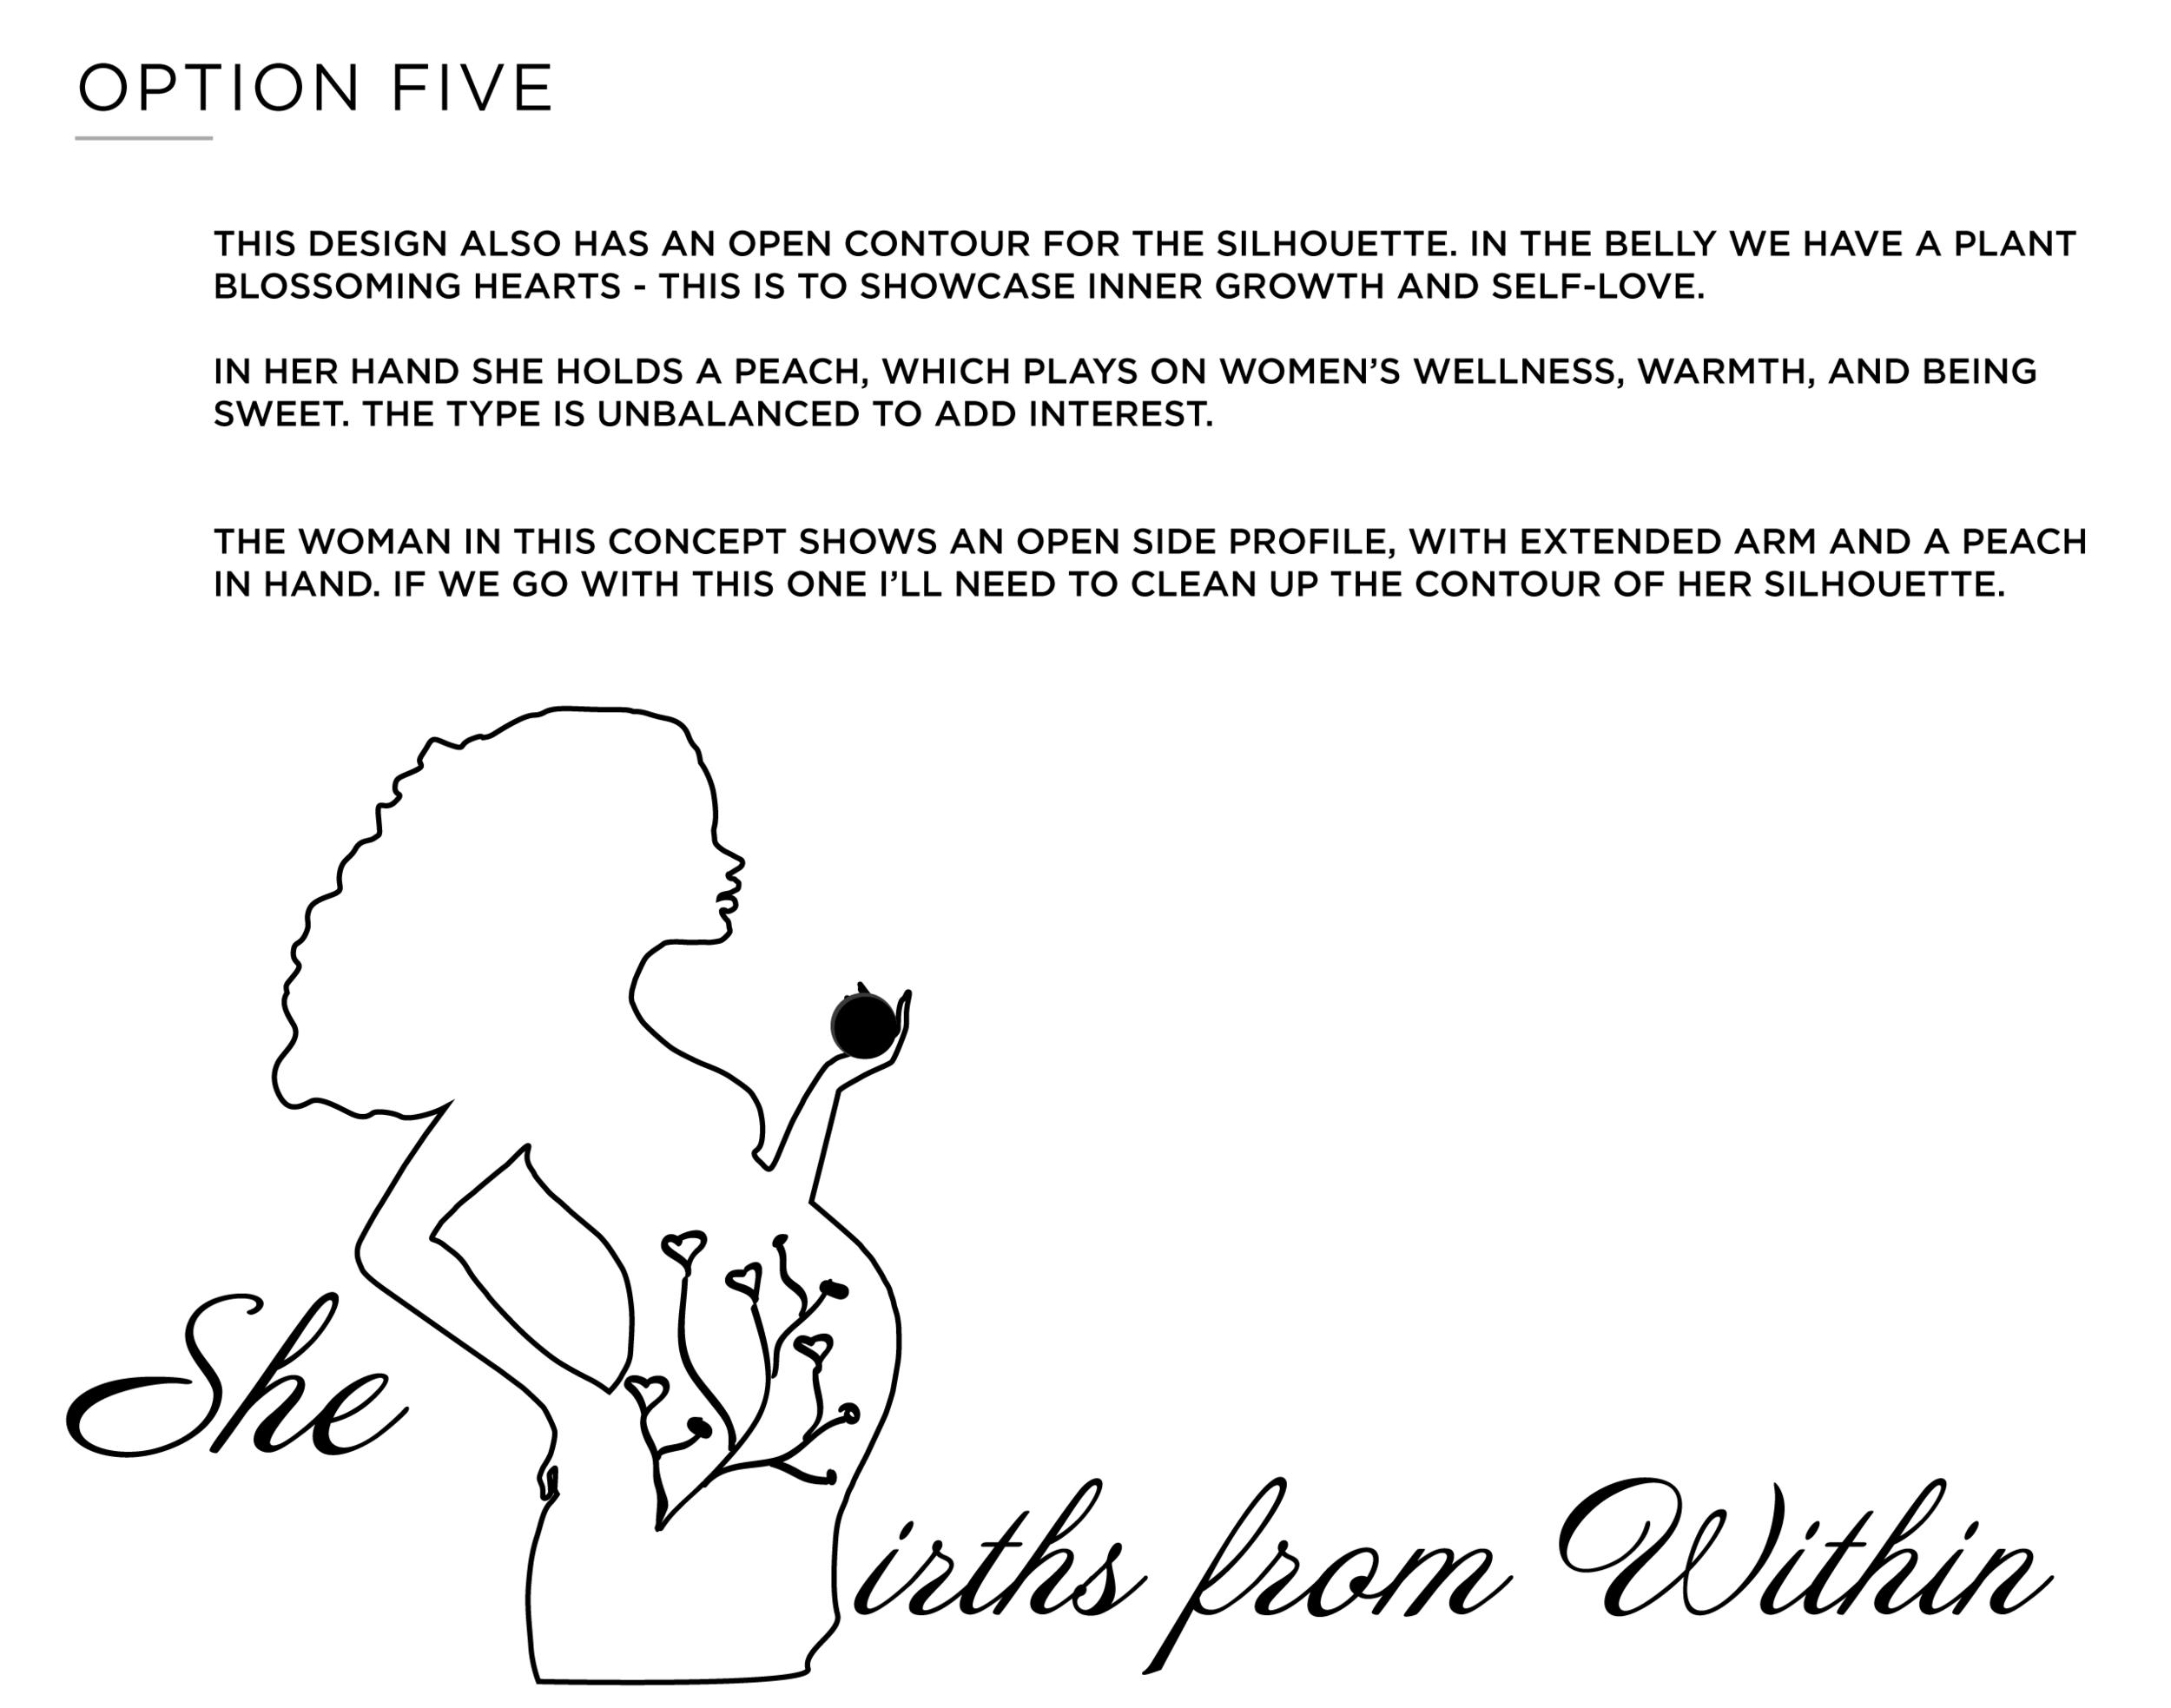 logo concepts-1_Option 5.png